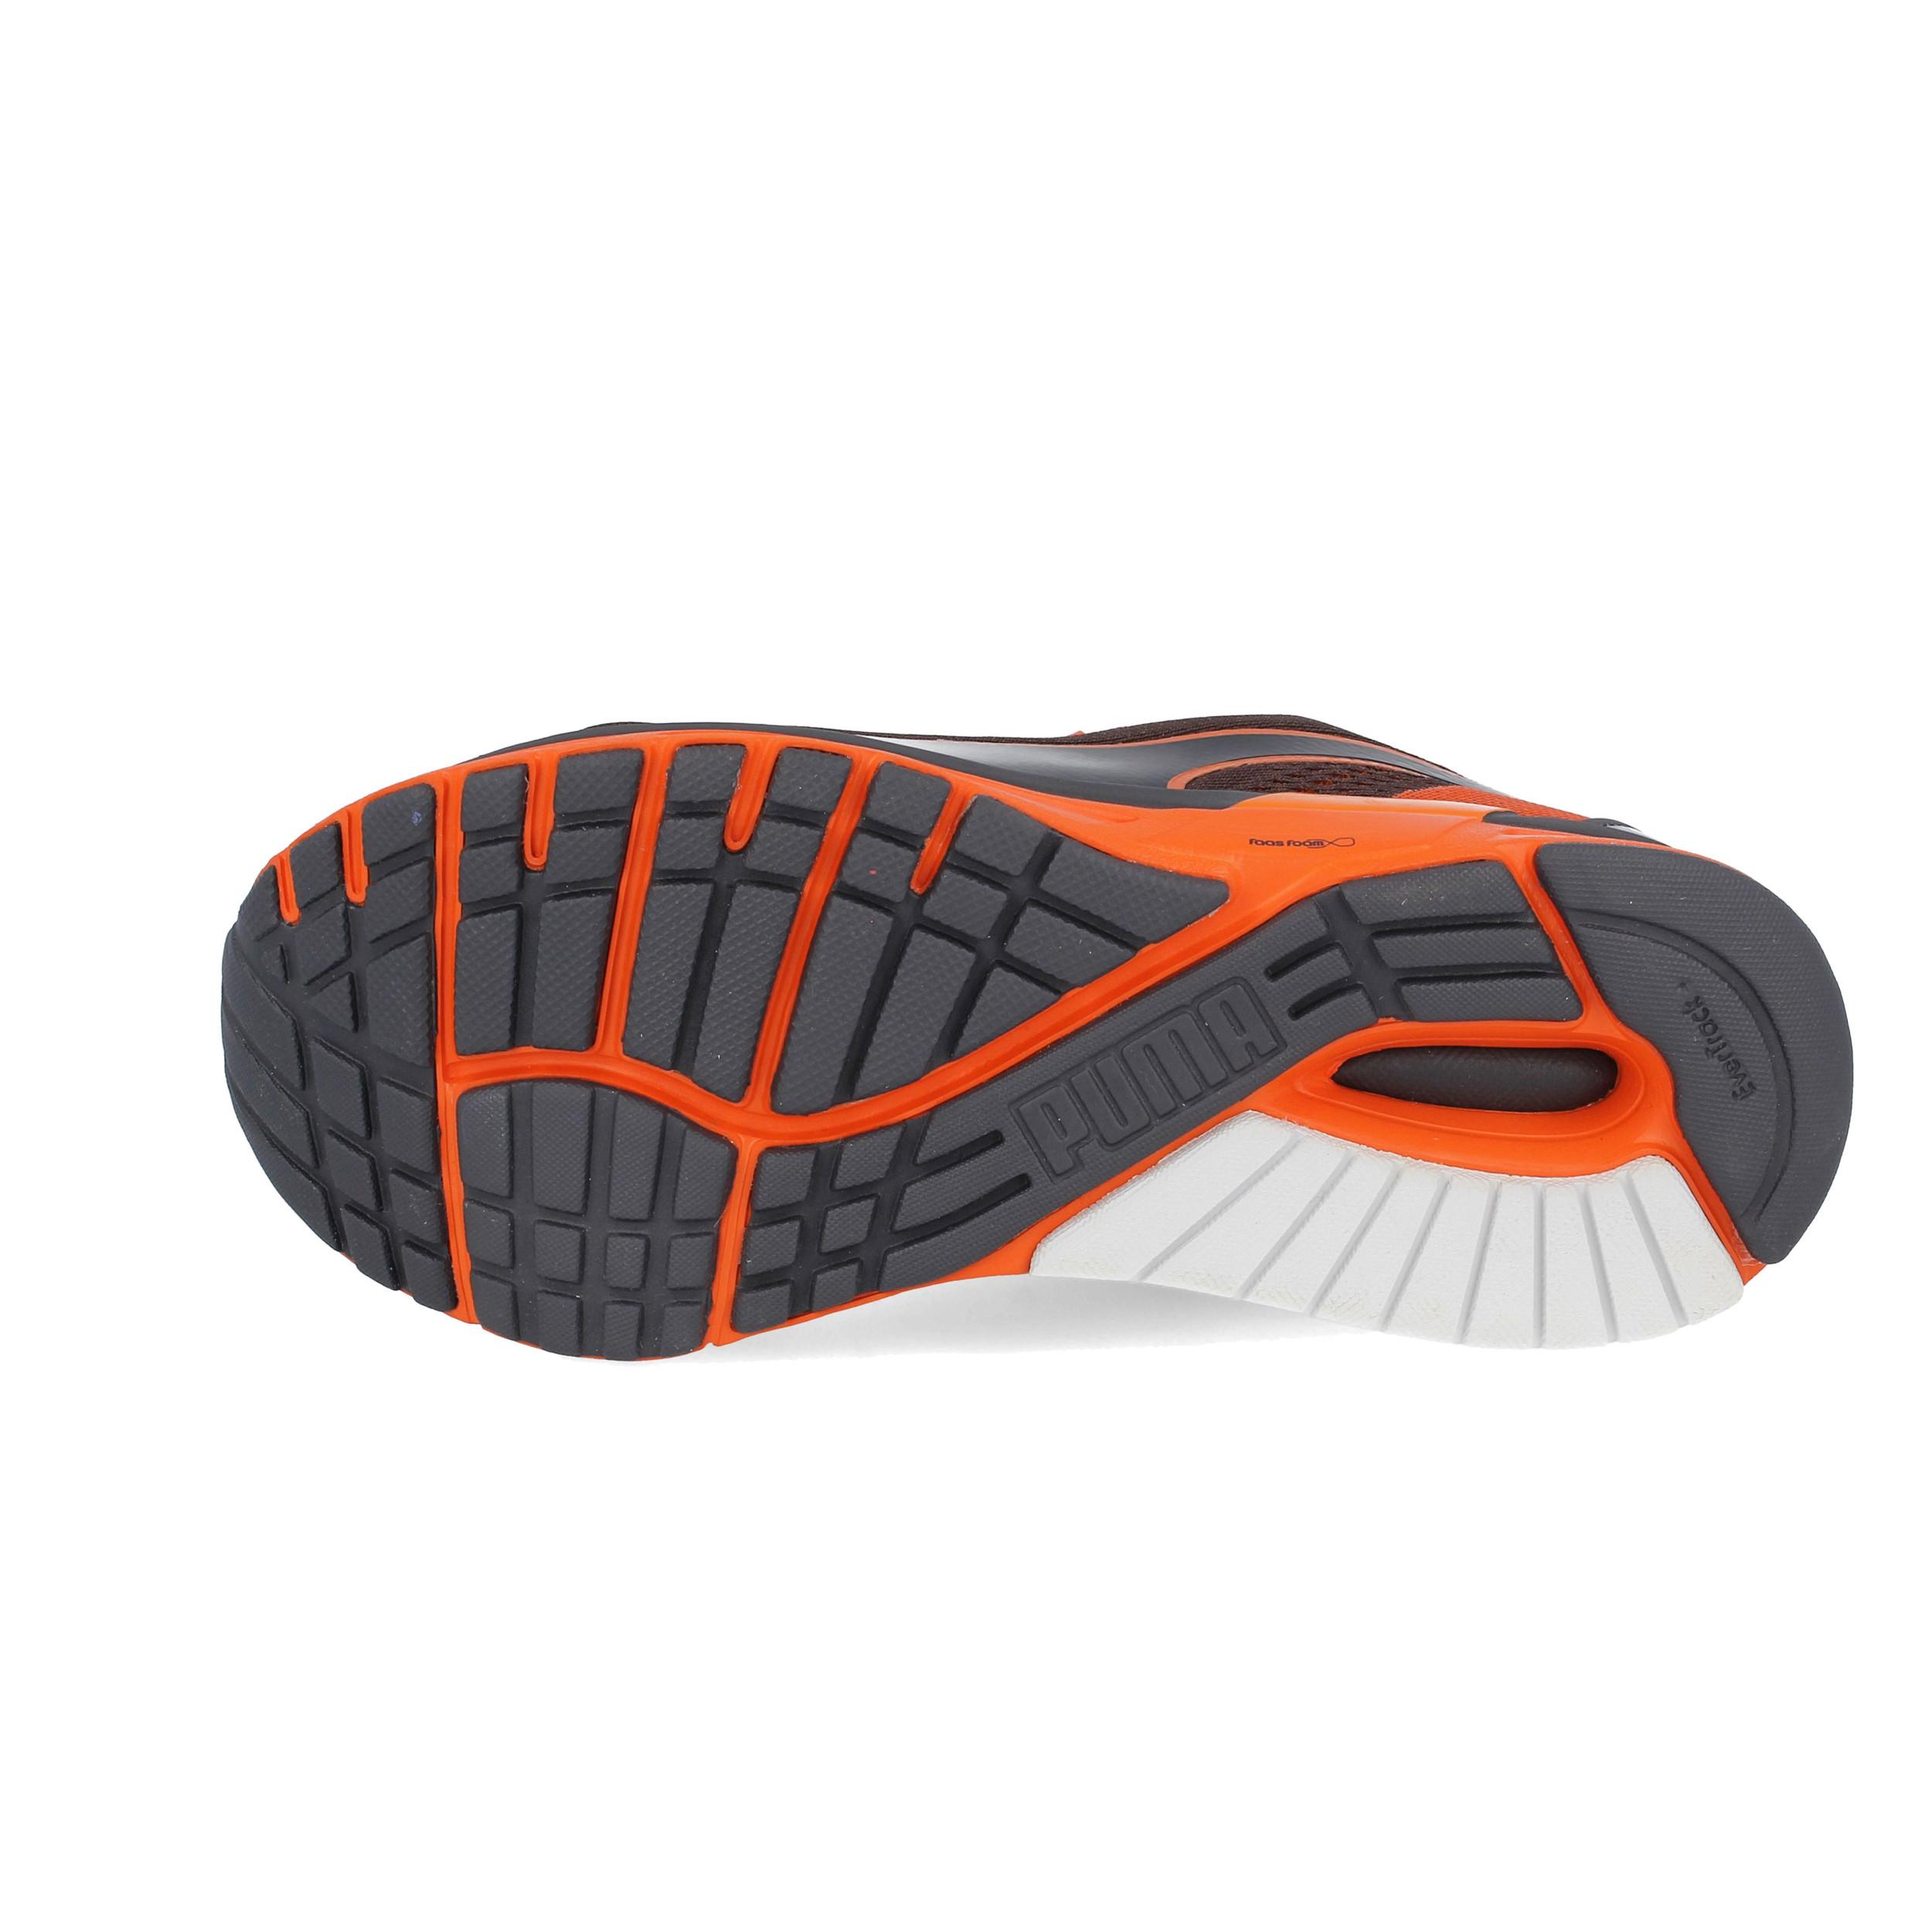 2f263ff5ffa Puma Mens Faas 600 S v2 Running Shoes Trainers Sneakers Black Orange Sports